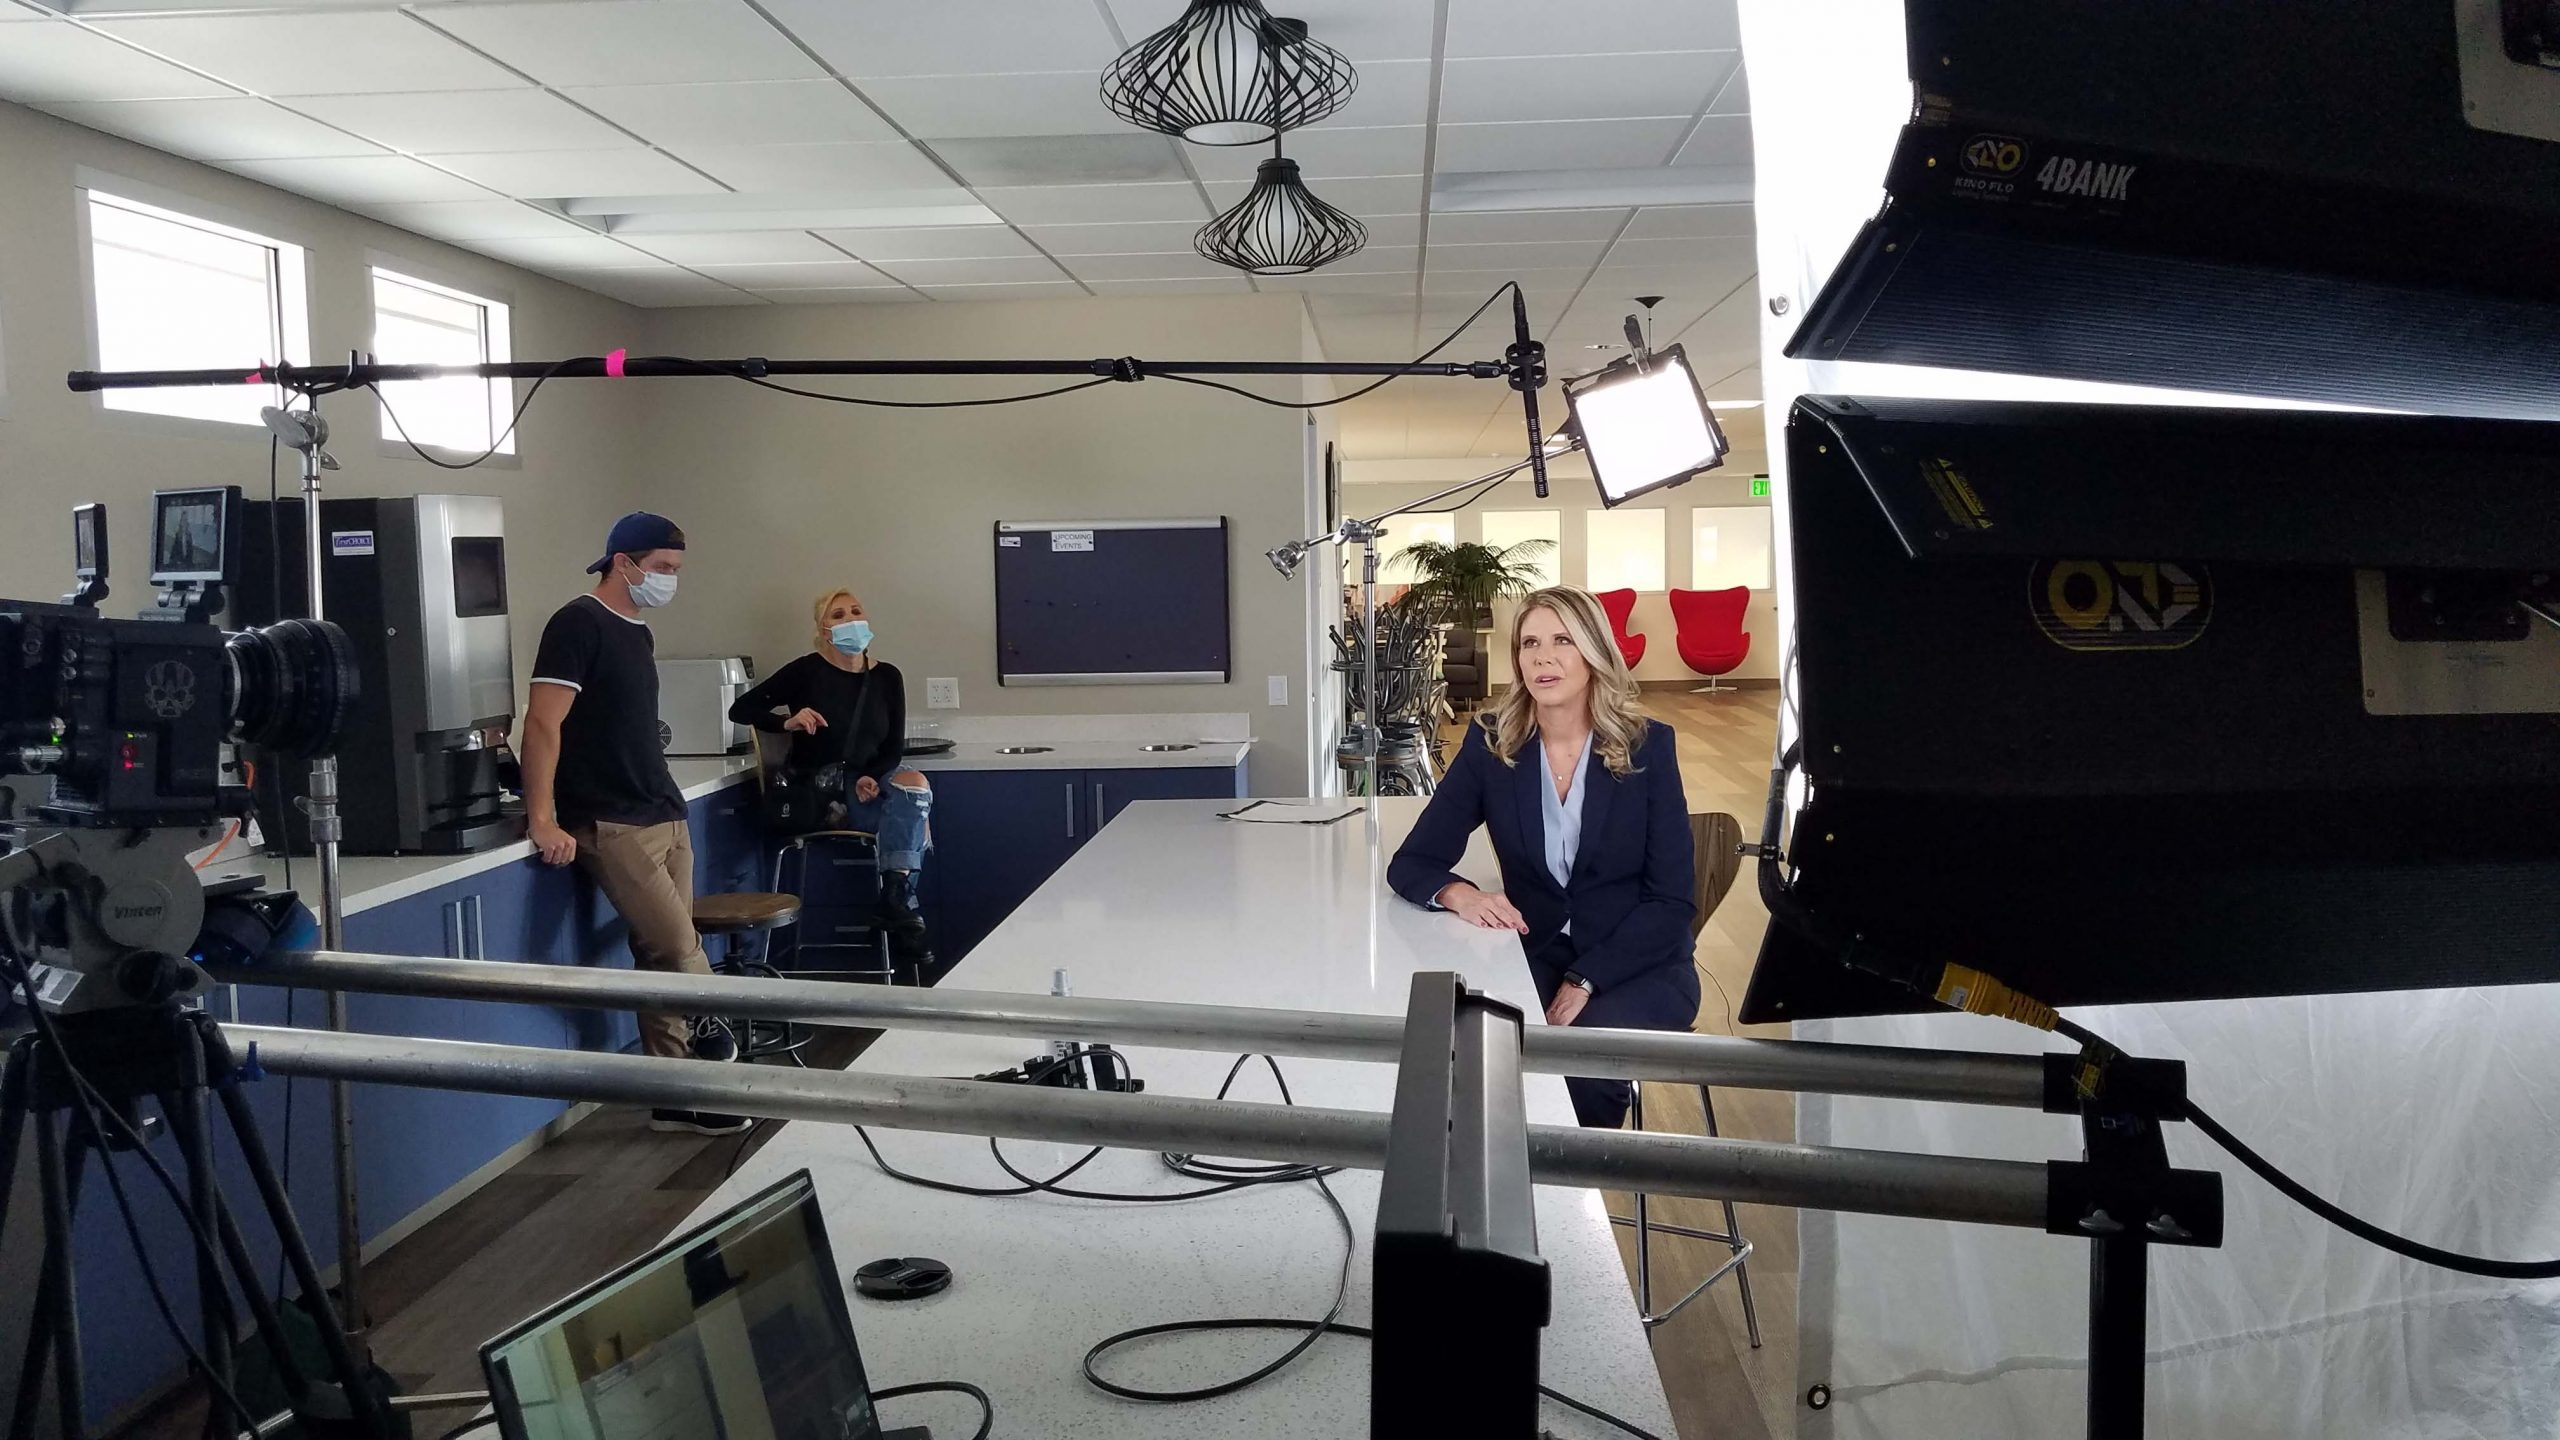 Orange County video production company